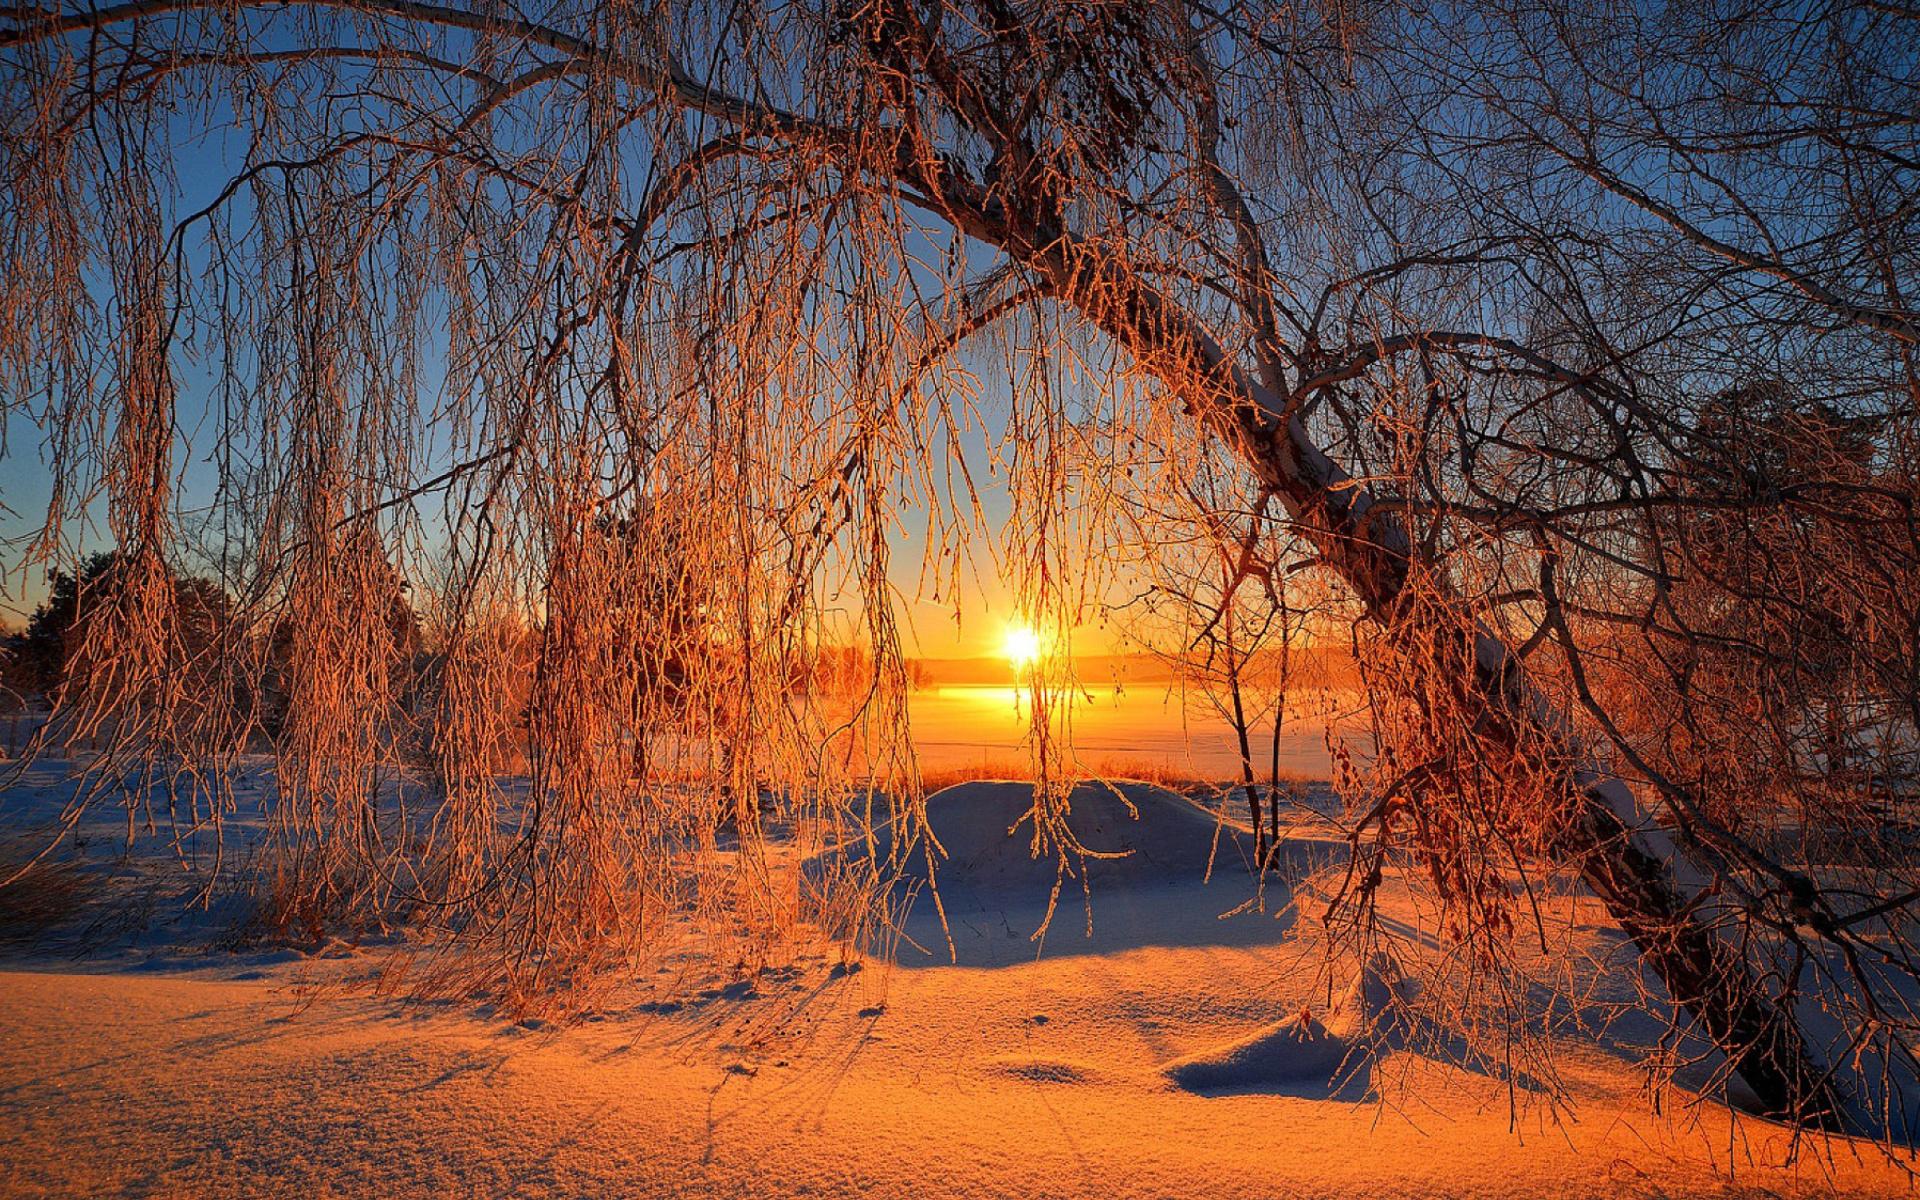 Fondo Pantalla Atardecer Navideño: Winter Sunset HD Wallpaper